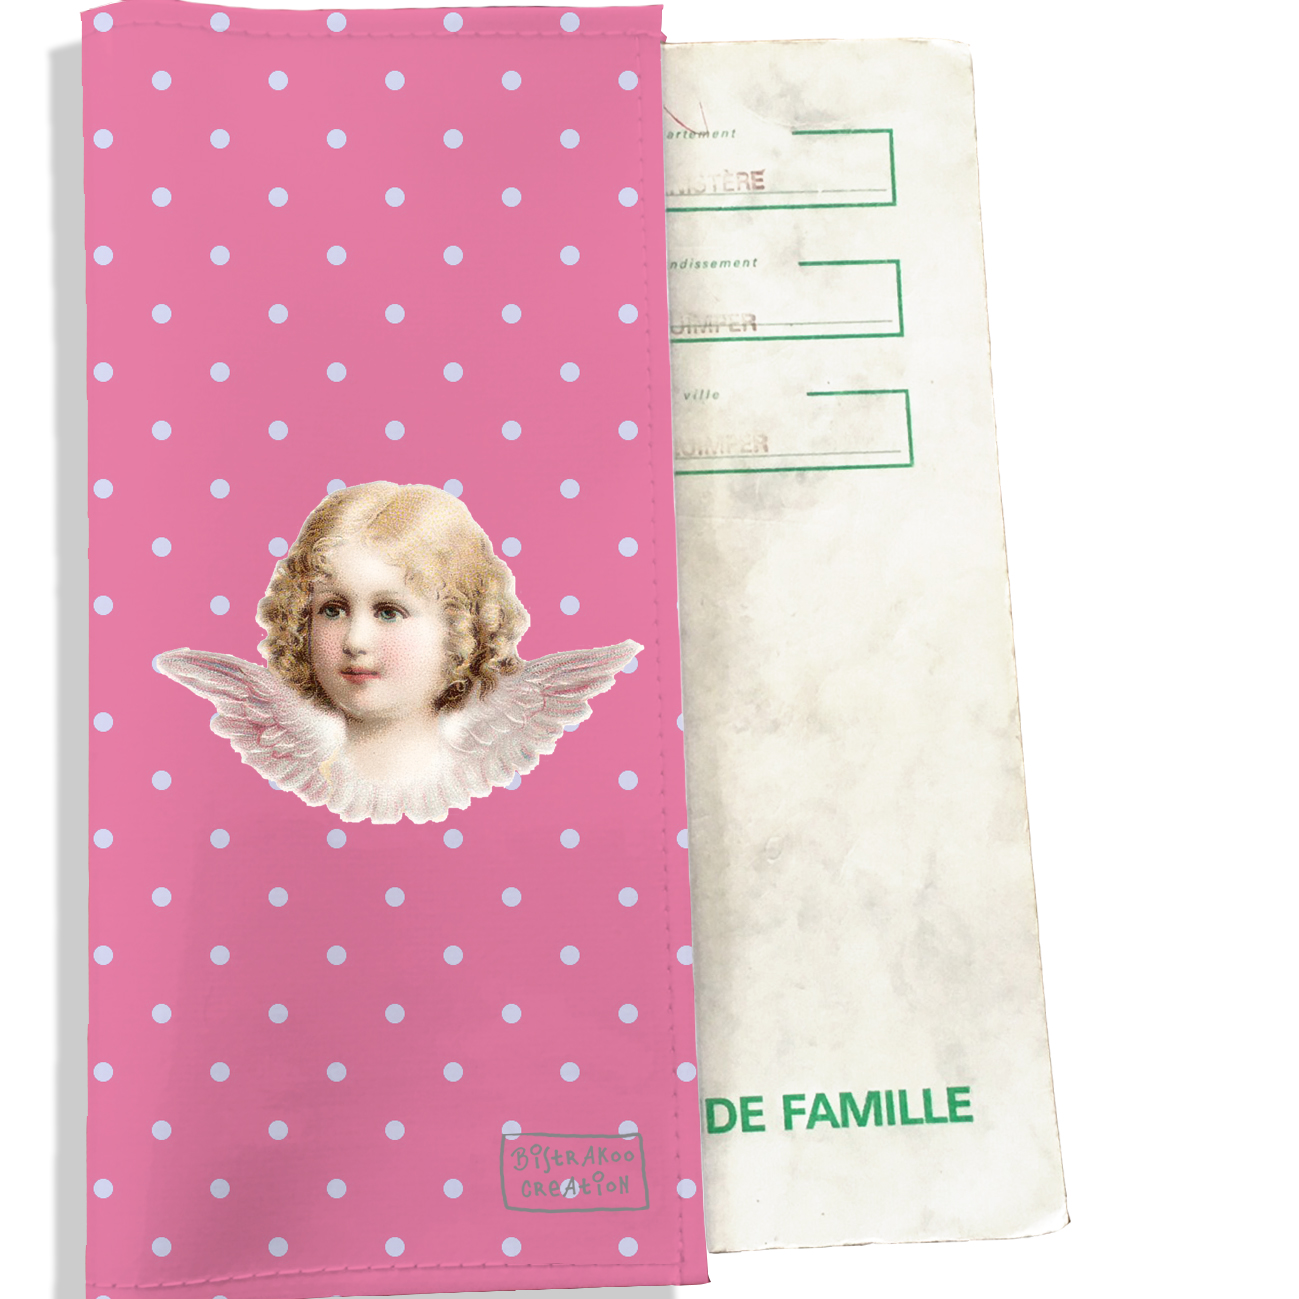 Protège livret de famille motif Ange fond rose pois bleu ciel L1493